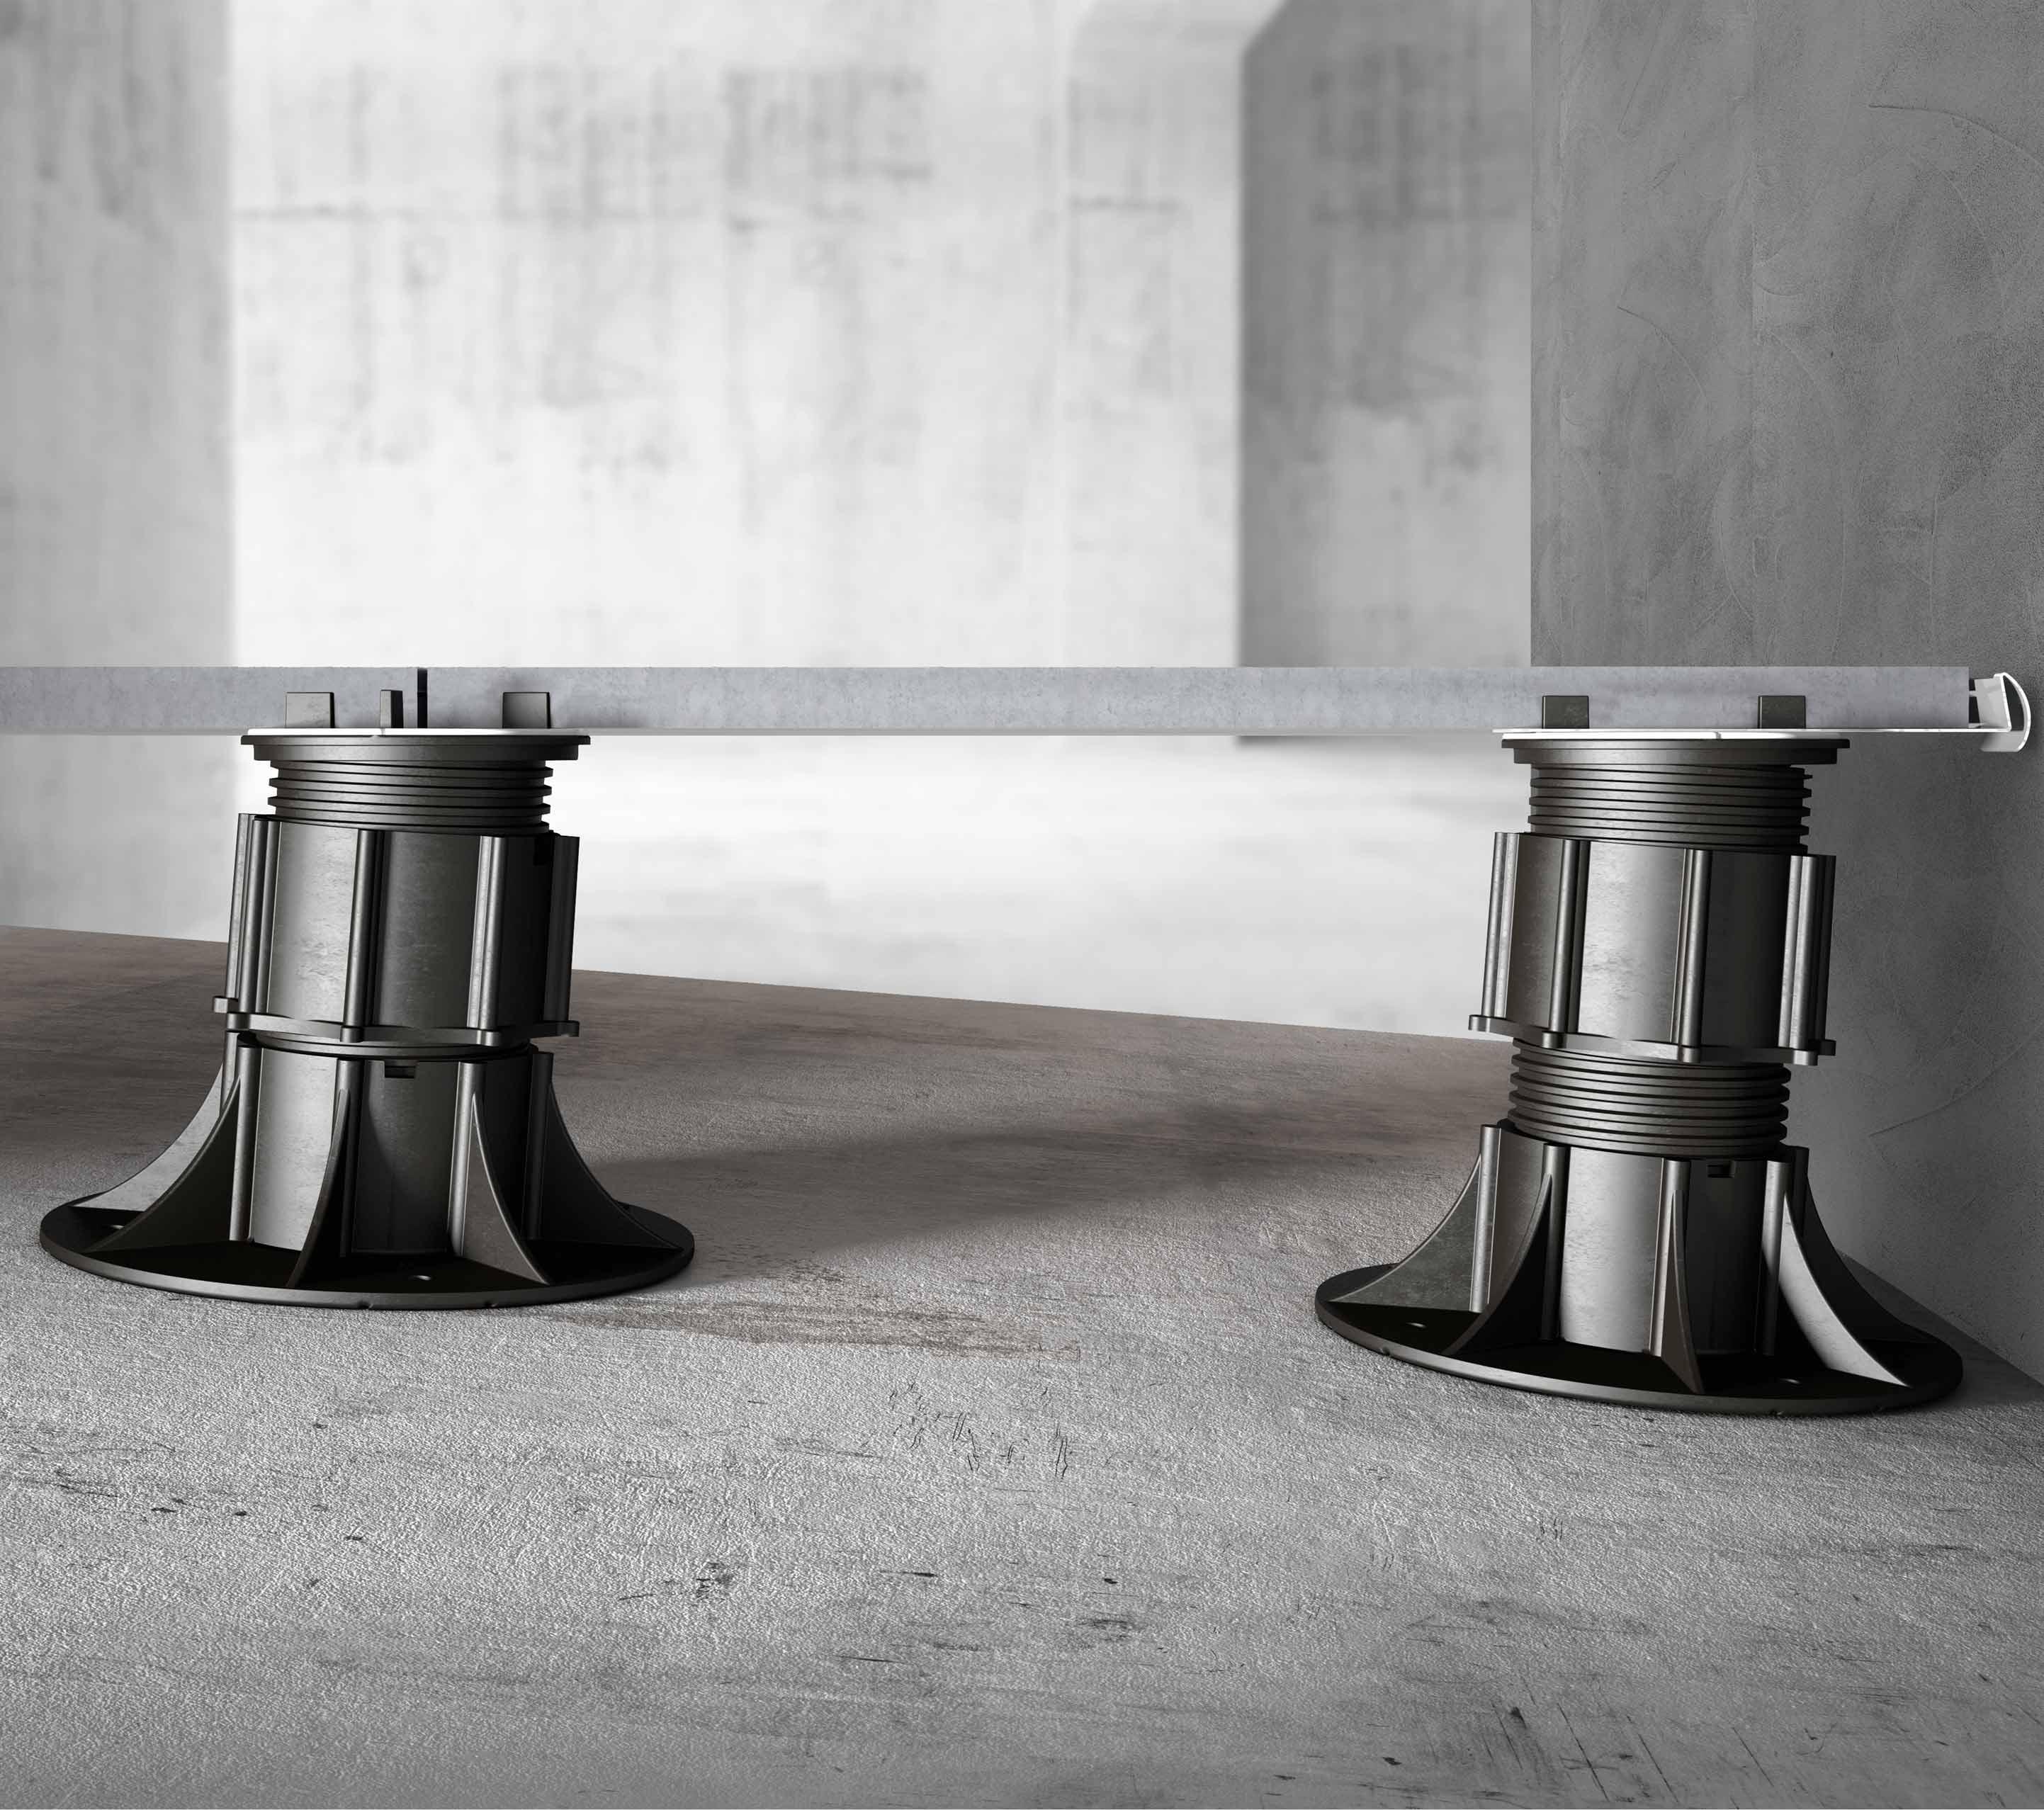 Products-Install-Products Hero install-products-pedestal-flooring